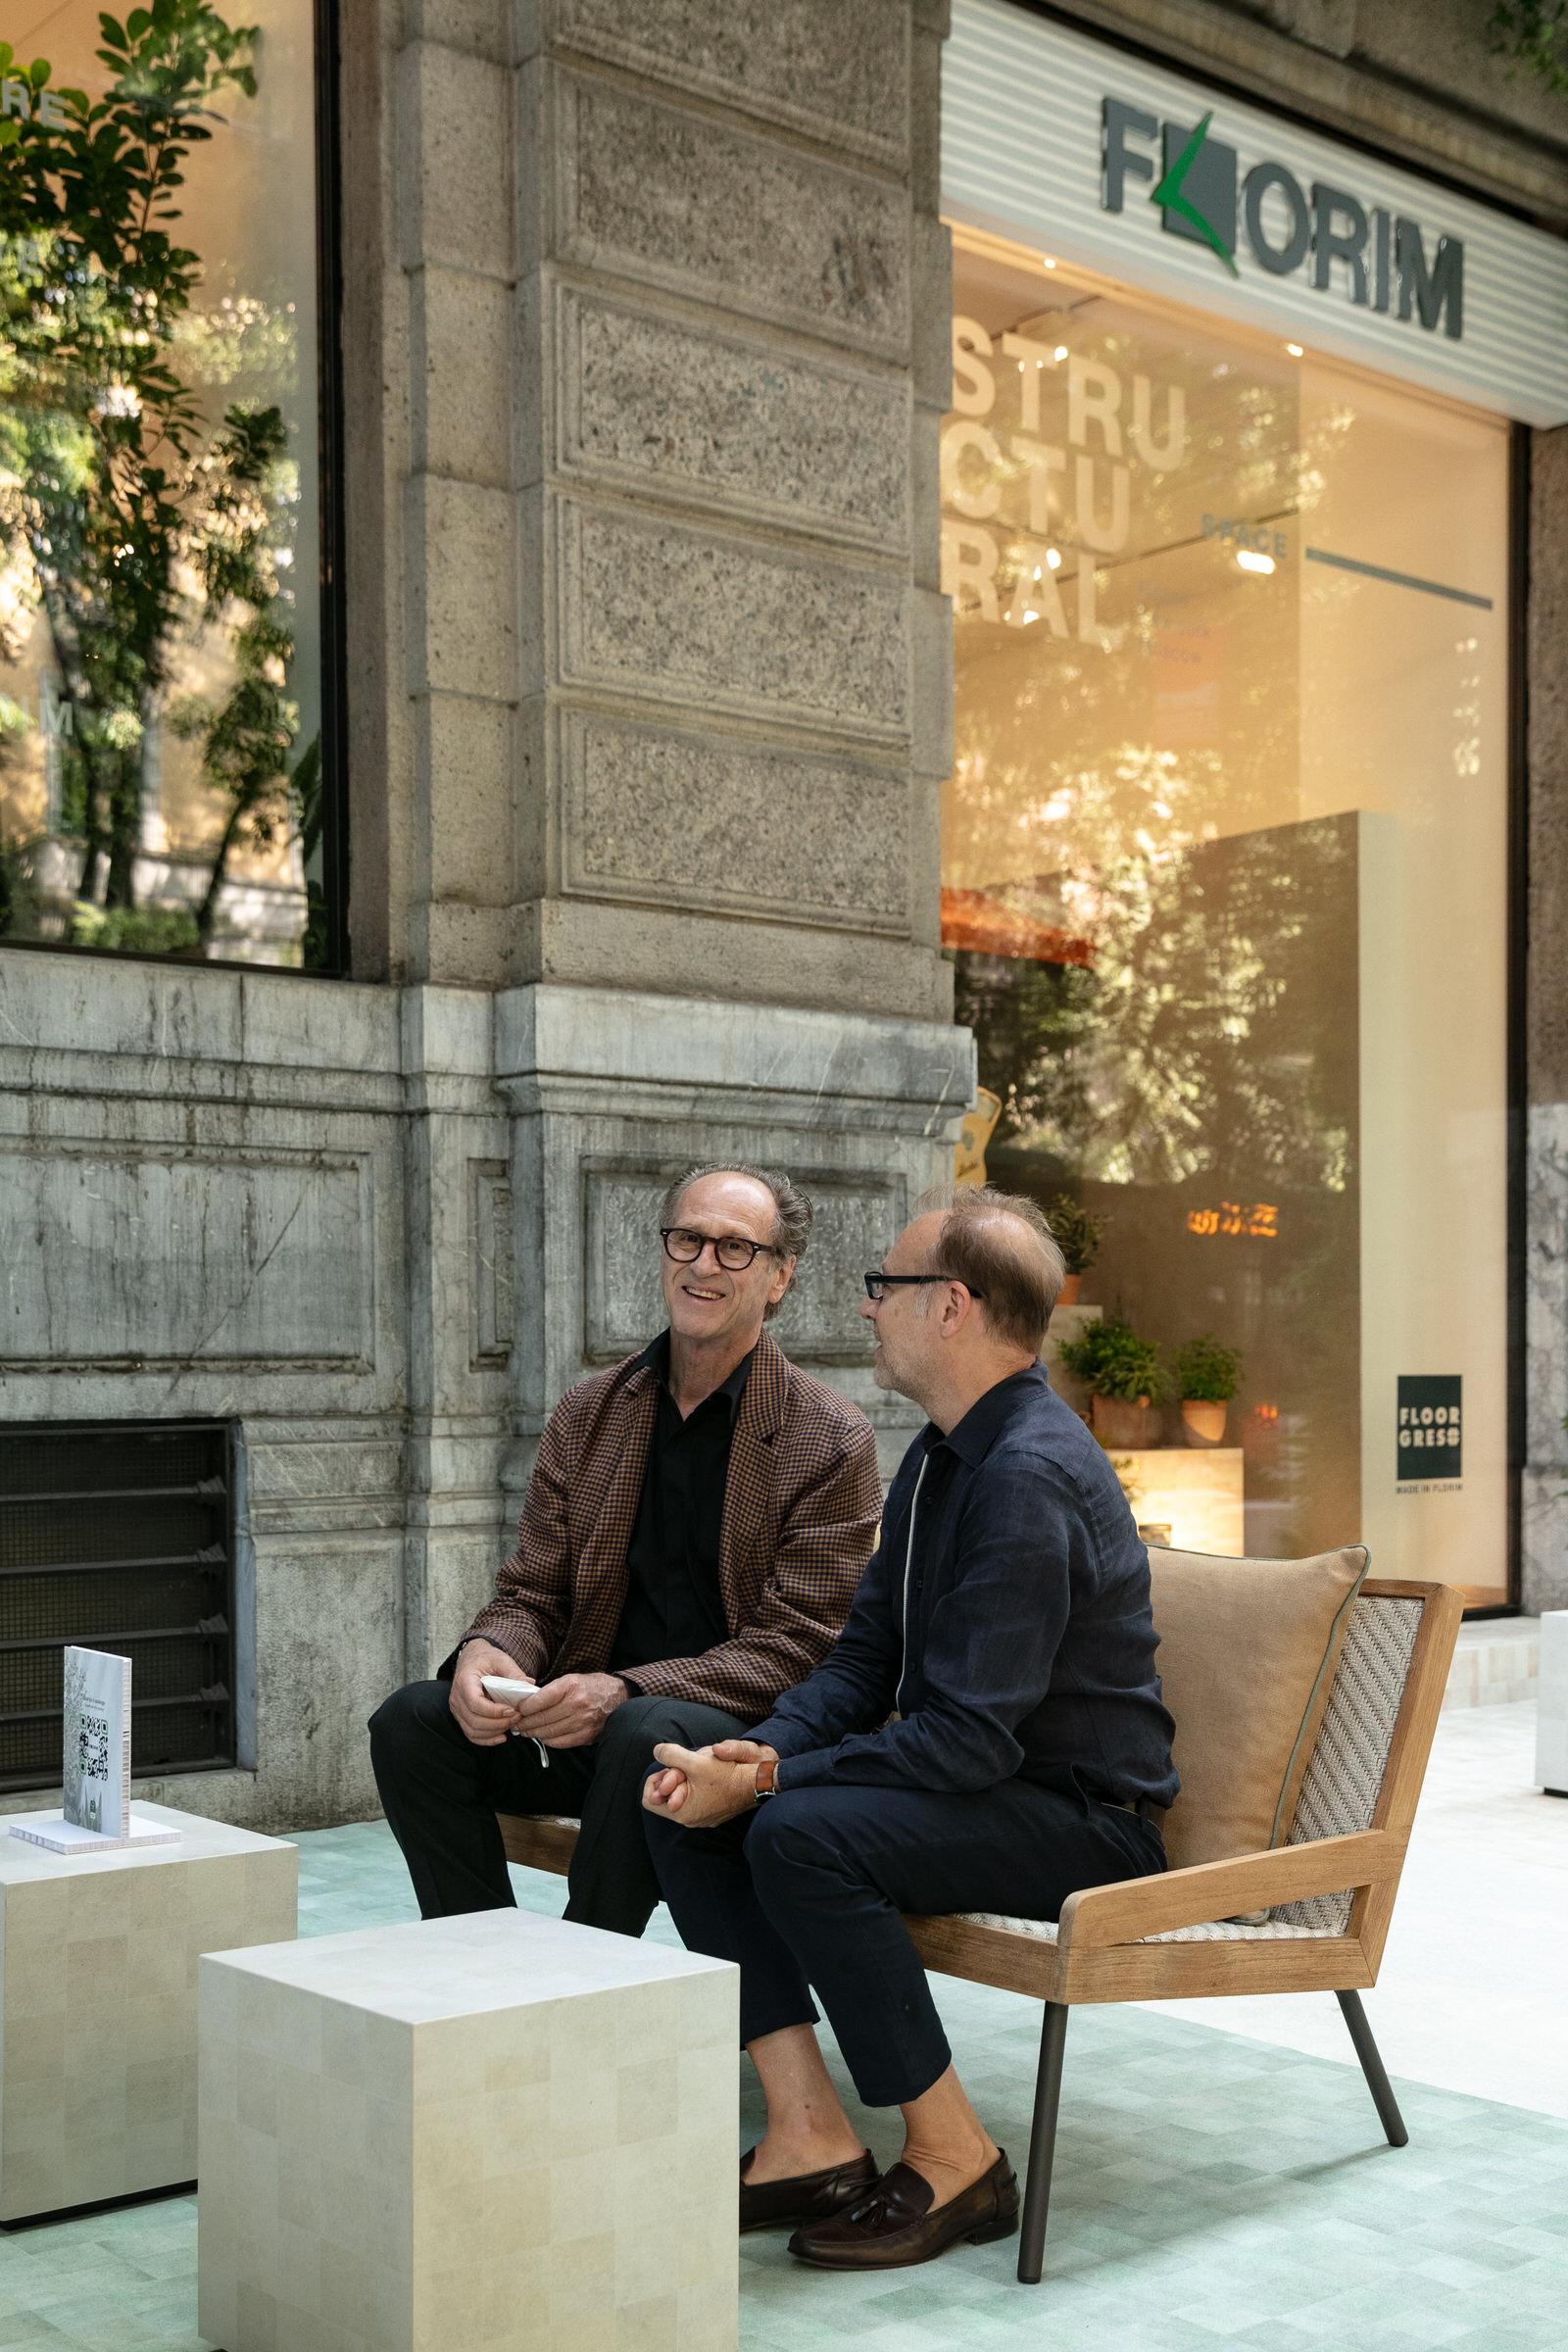 Florim Sensi Pigmenti Installation Milan Design Week 2021 Yellowtrace 05a